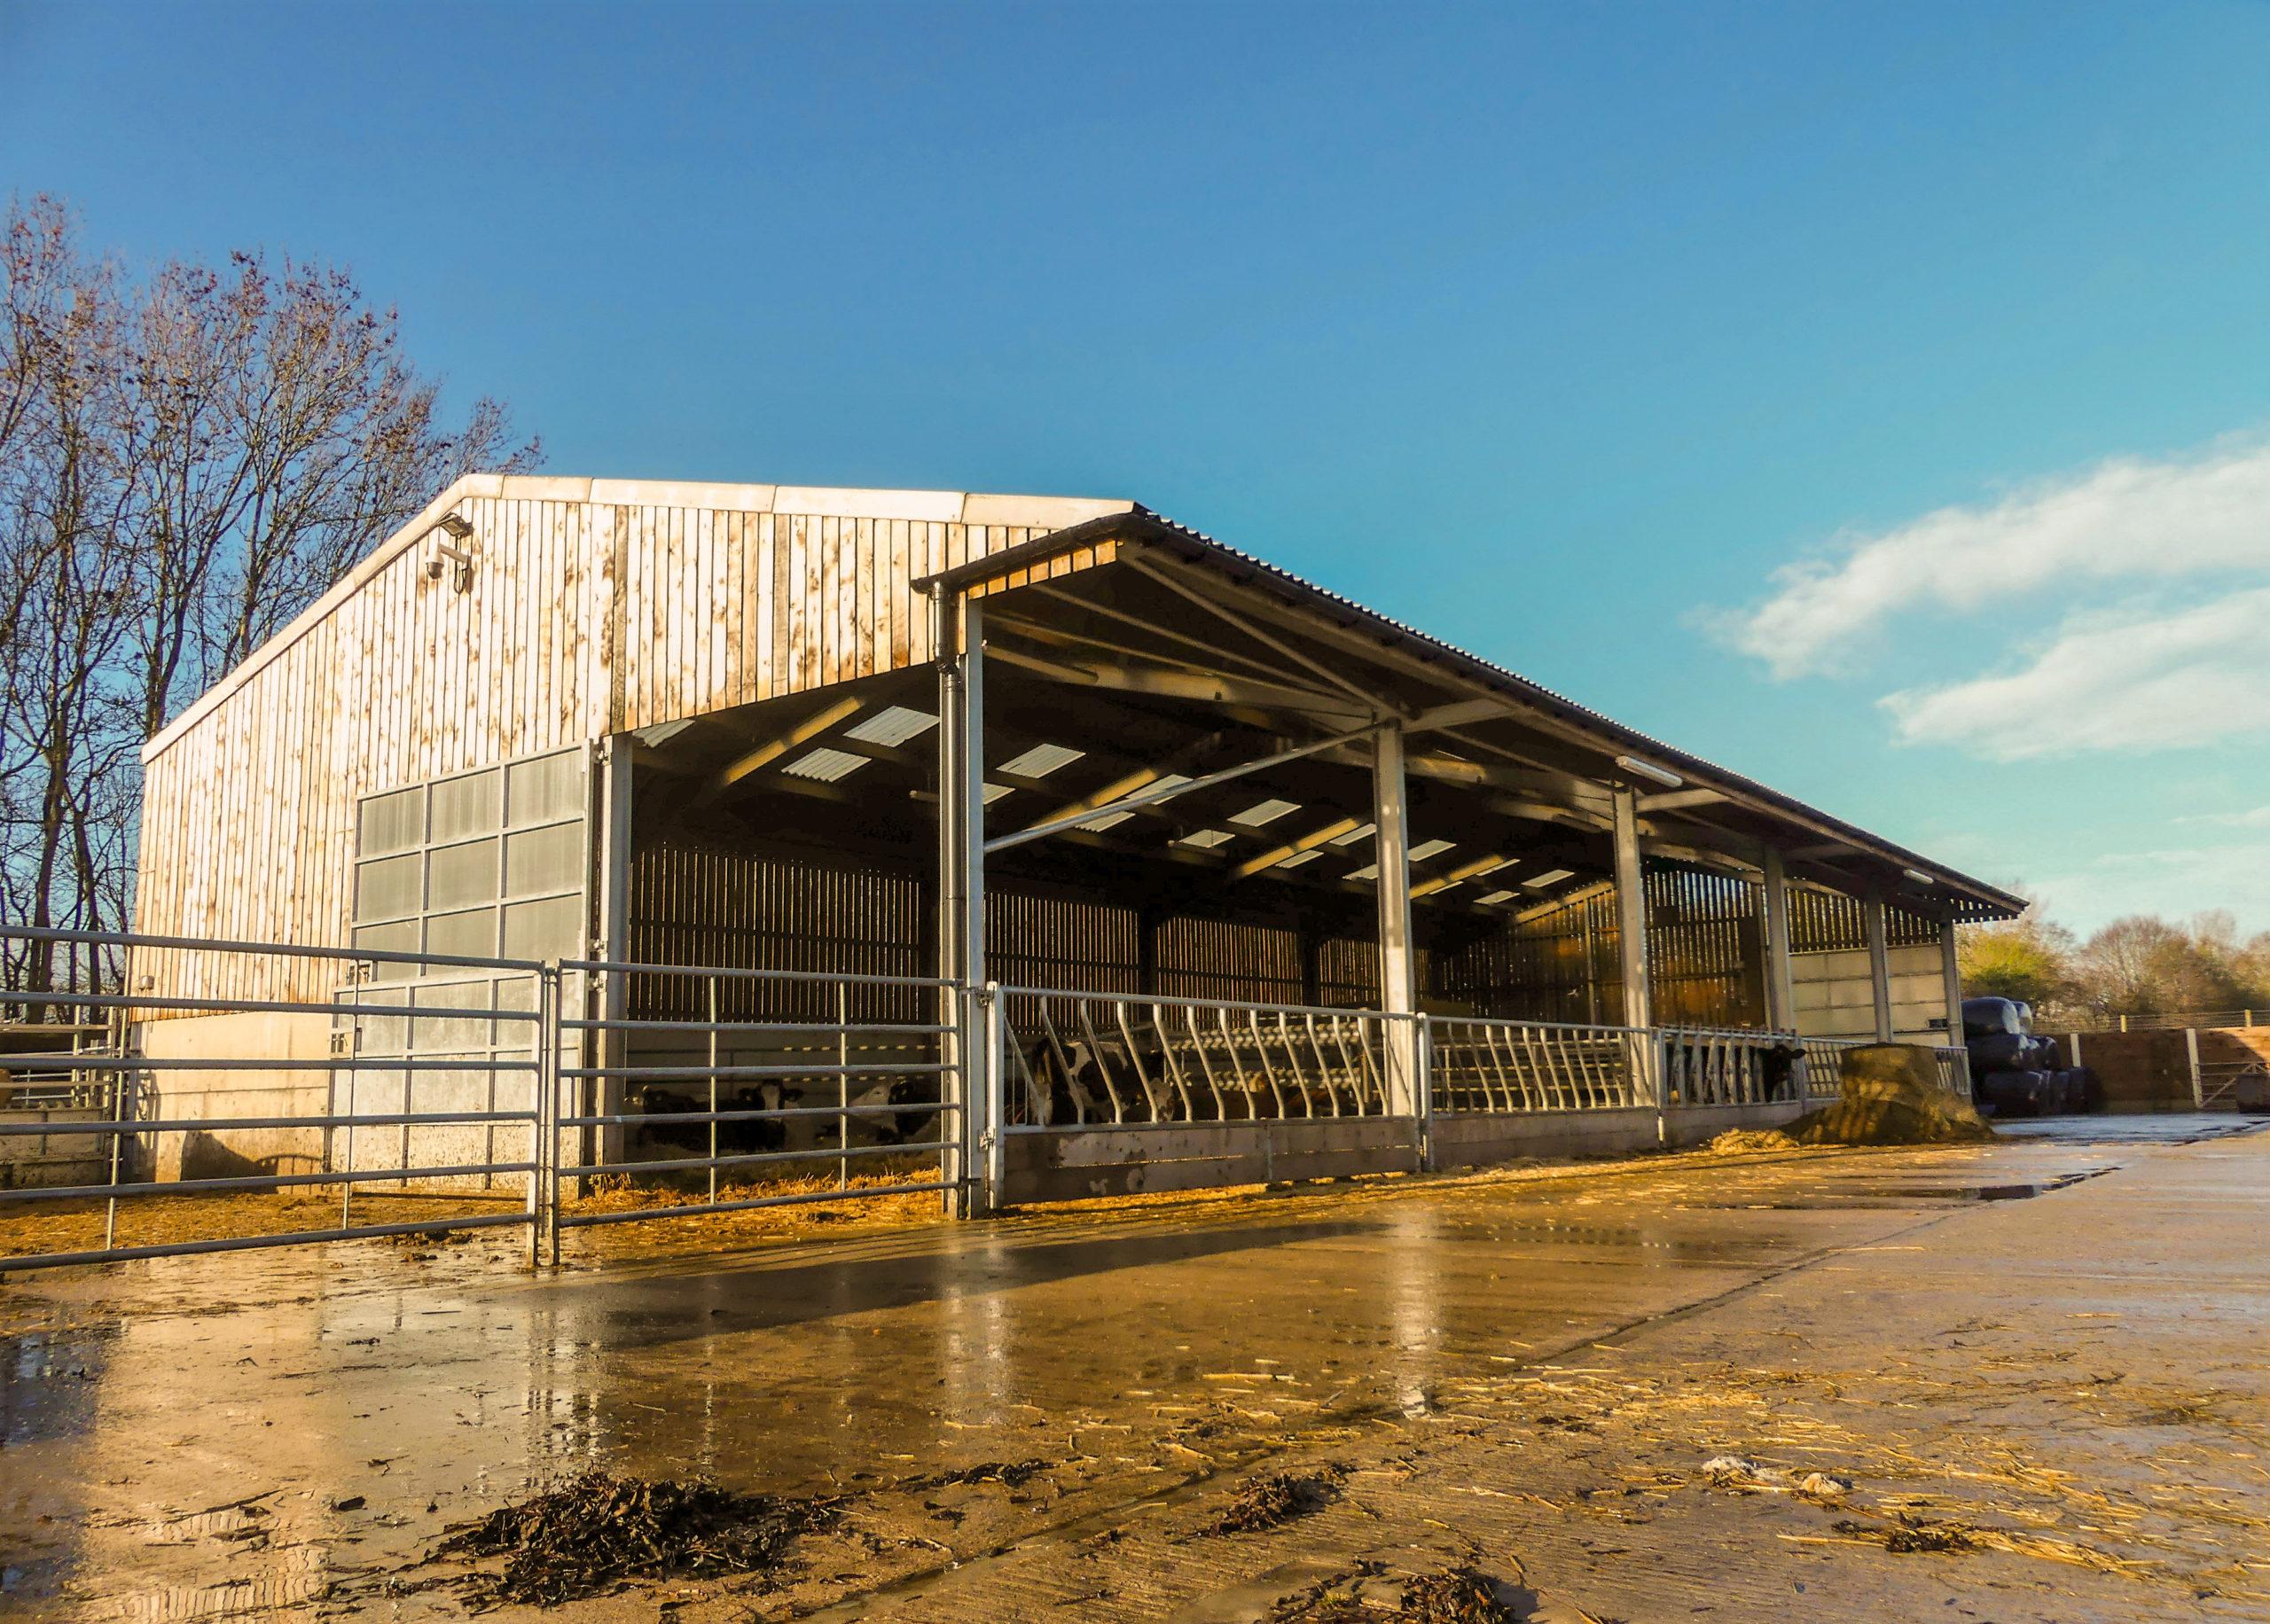 Farm yard barn building - Bovine TB